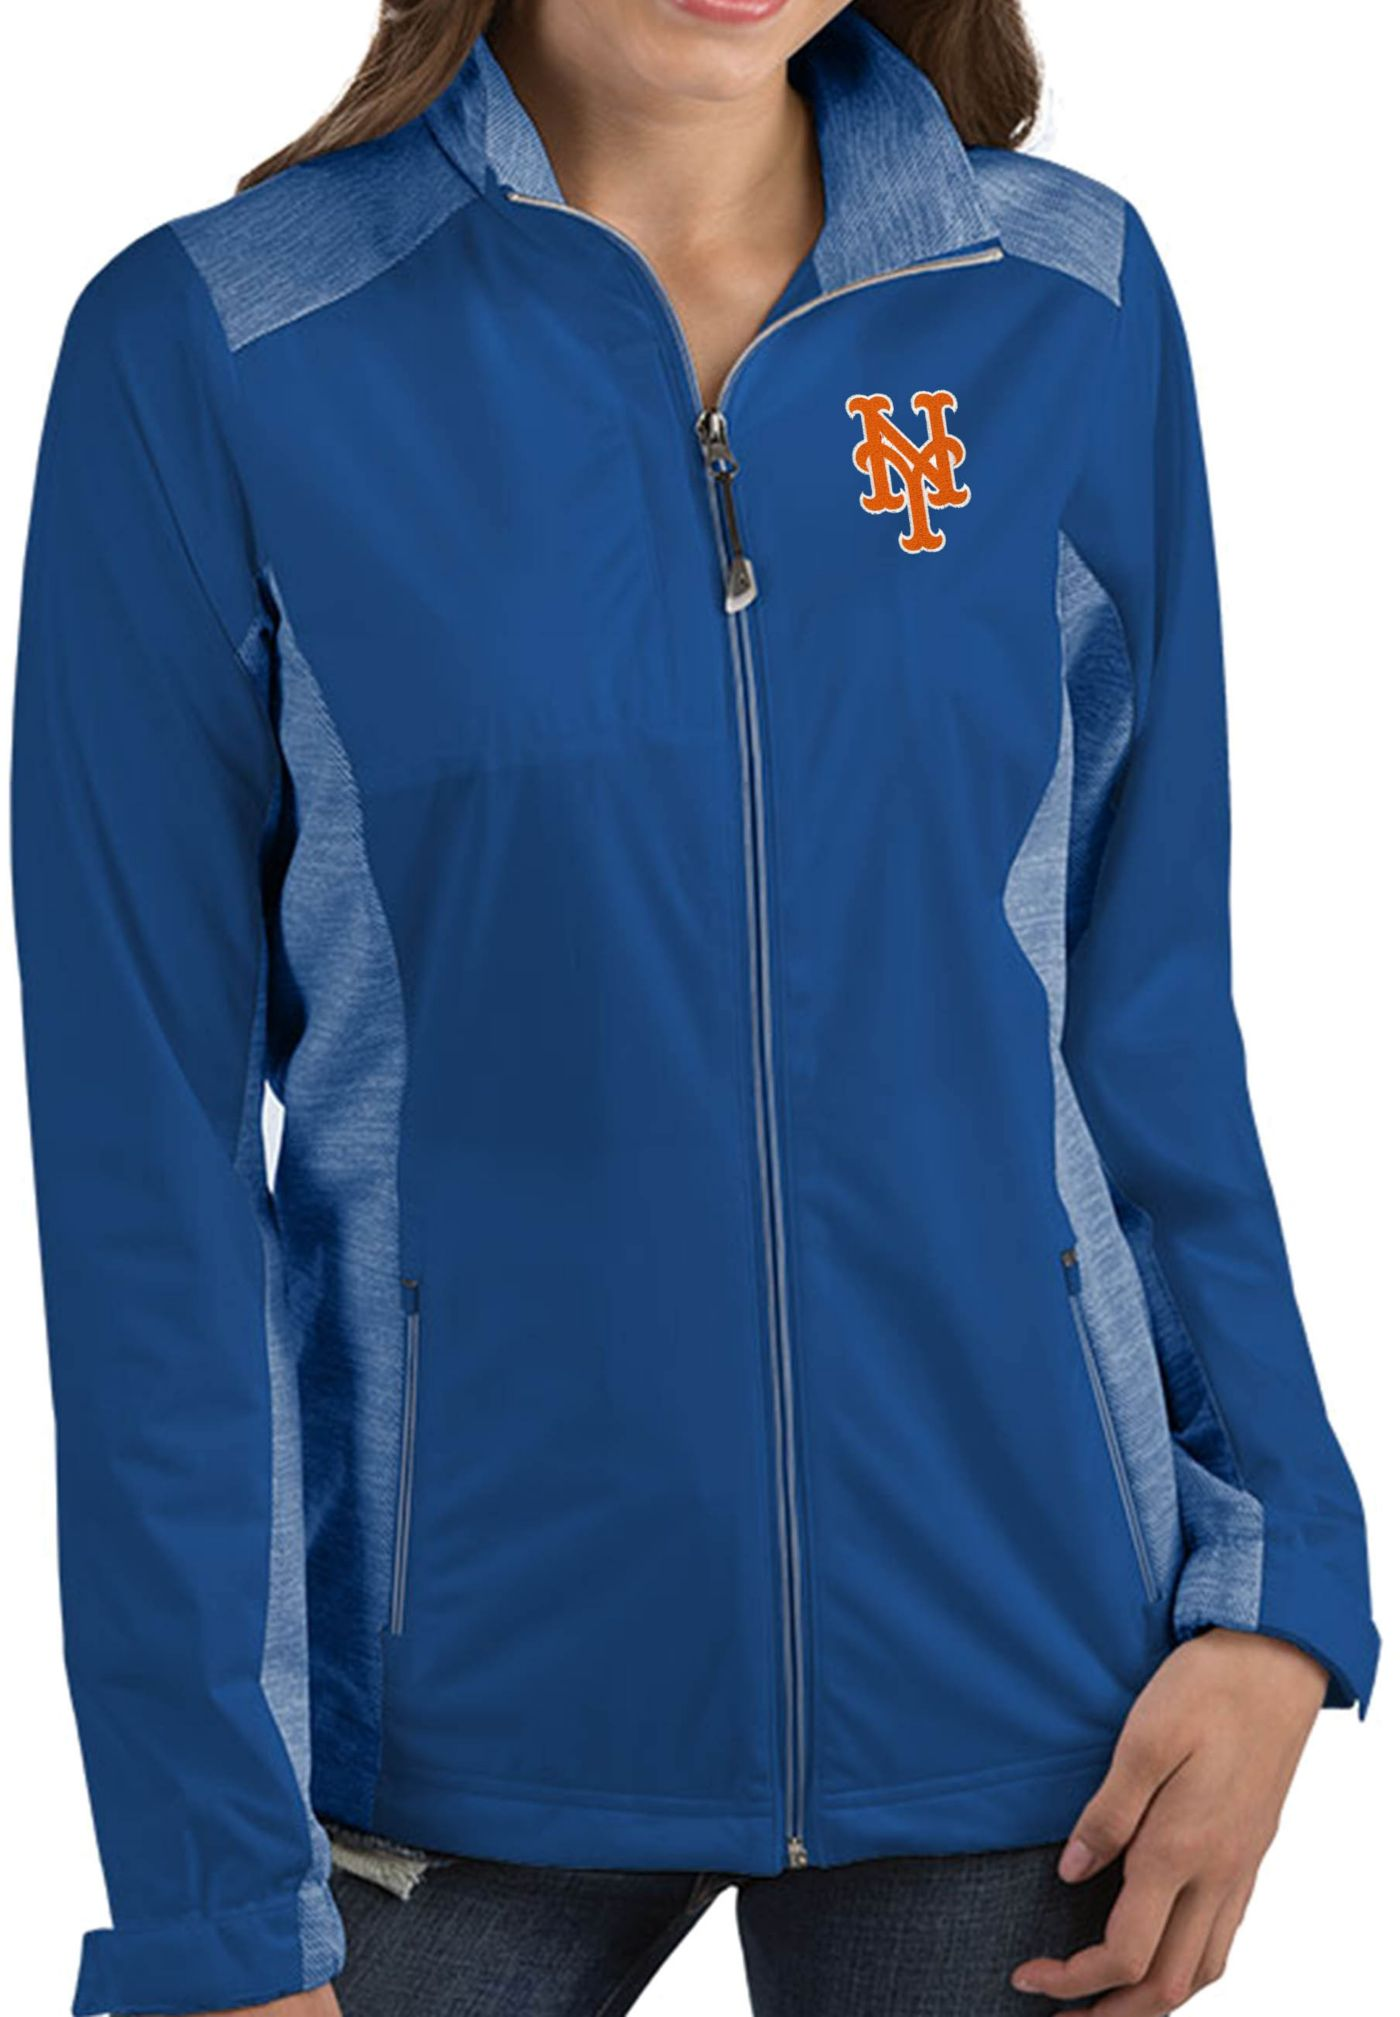 Antigua Women's New York Mets Revolve Royal Full-Zip Jacket